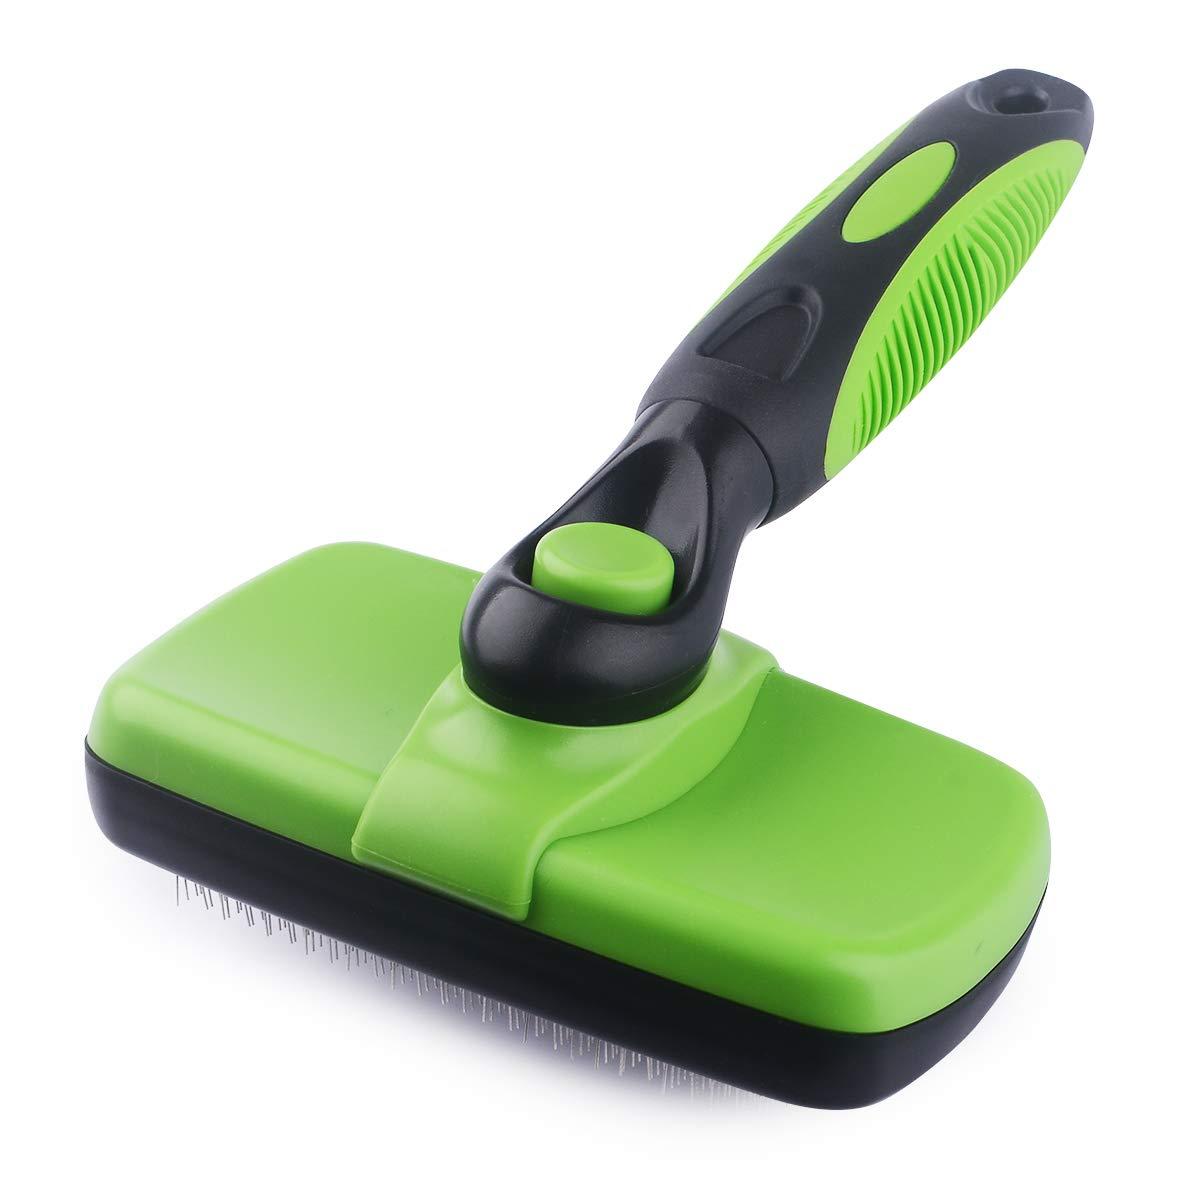 WLWQ Dog Brush & Cat Brush- Slicker Pet Grooming Brush